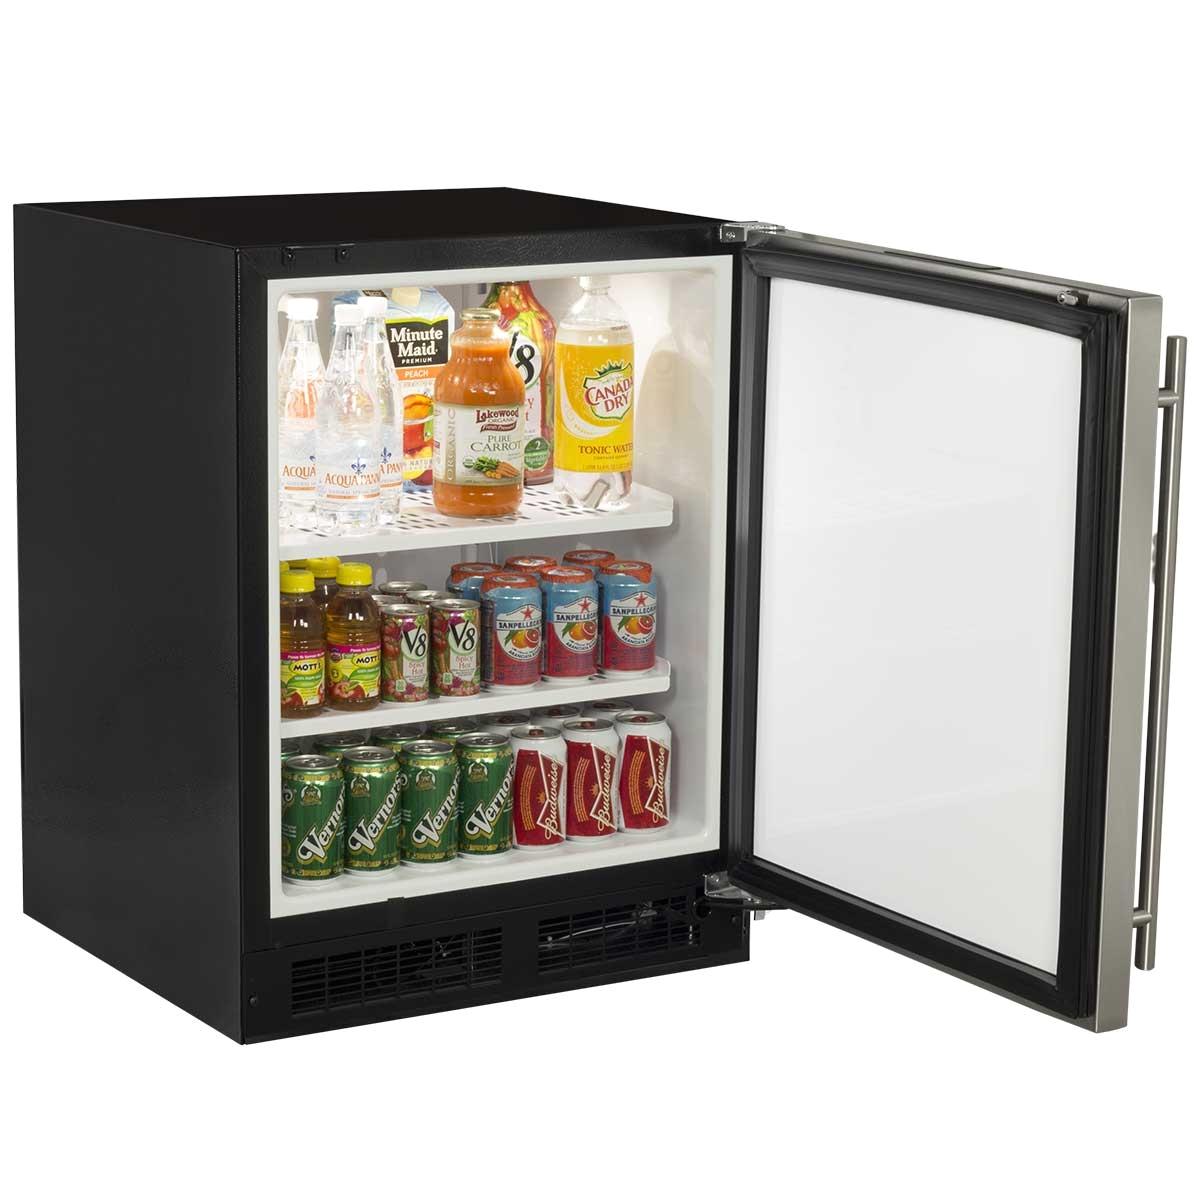 24″ low profile all refrigerator ma24ras1